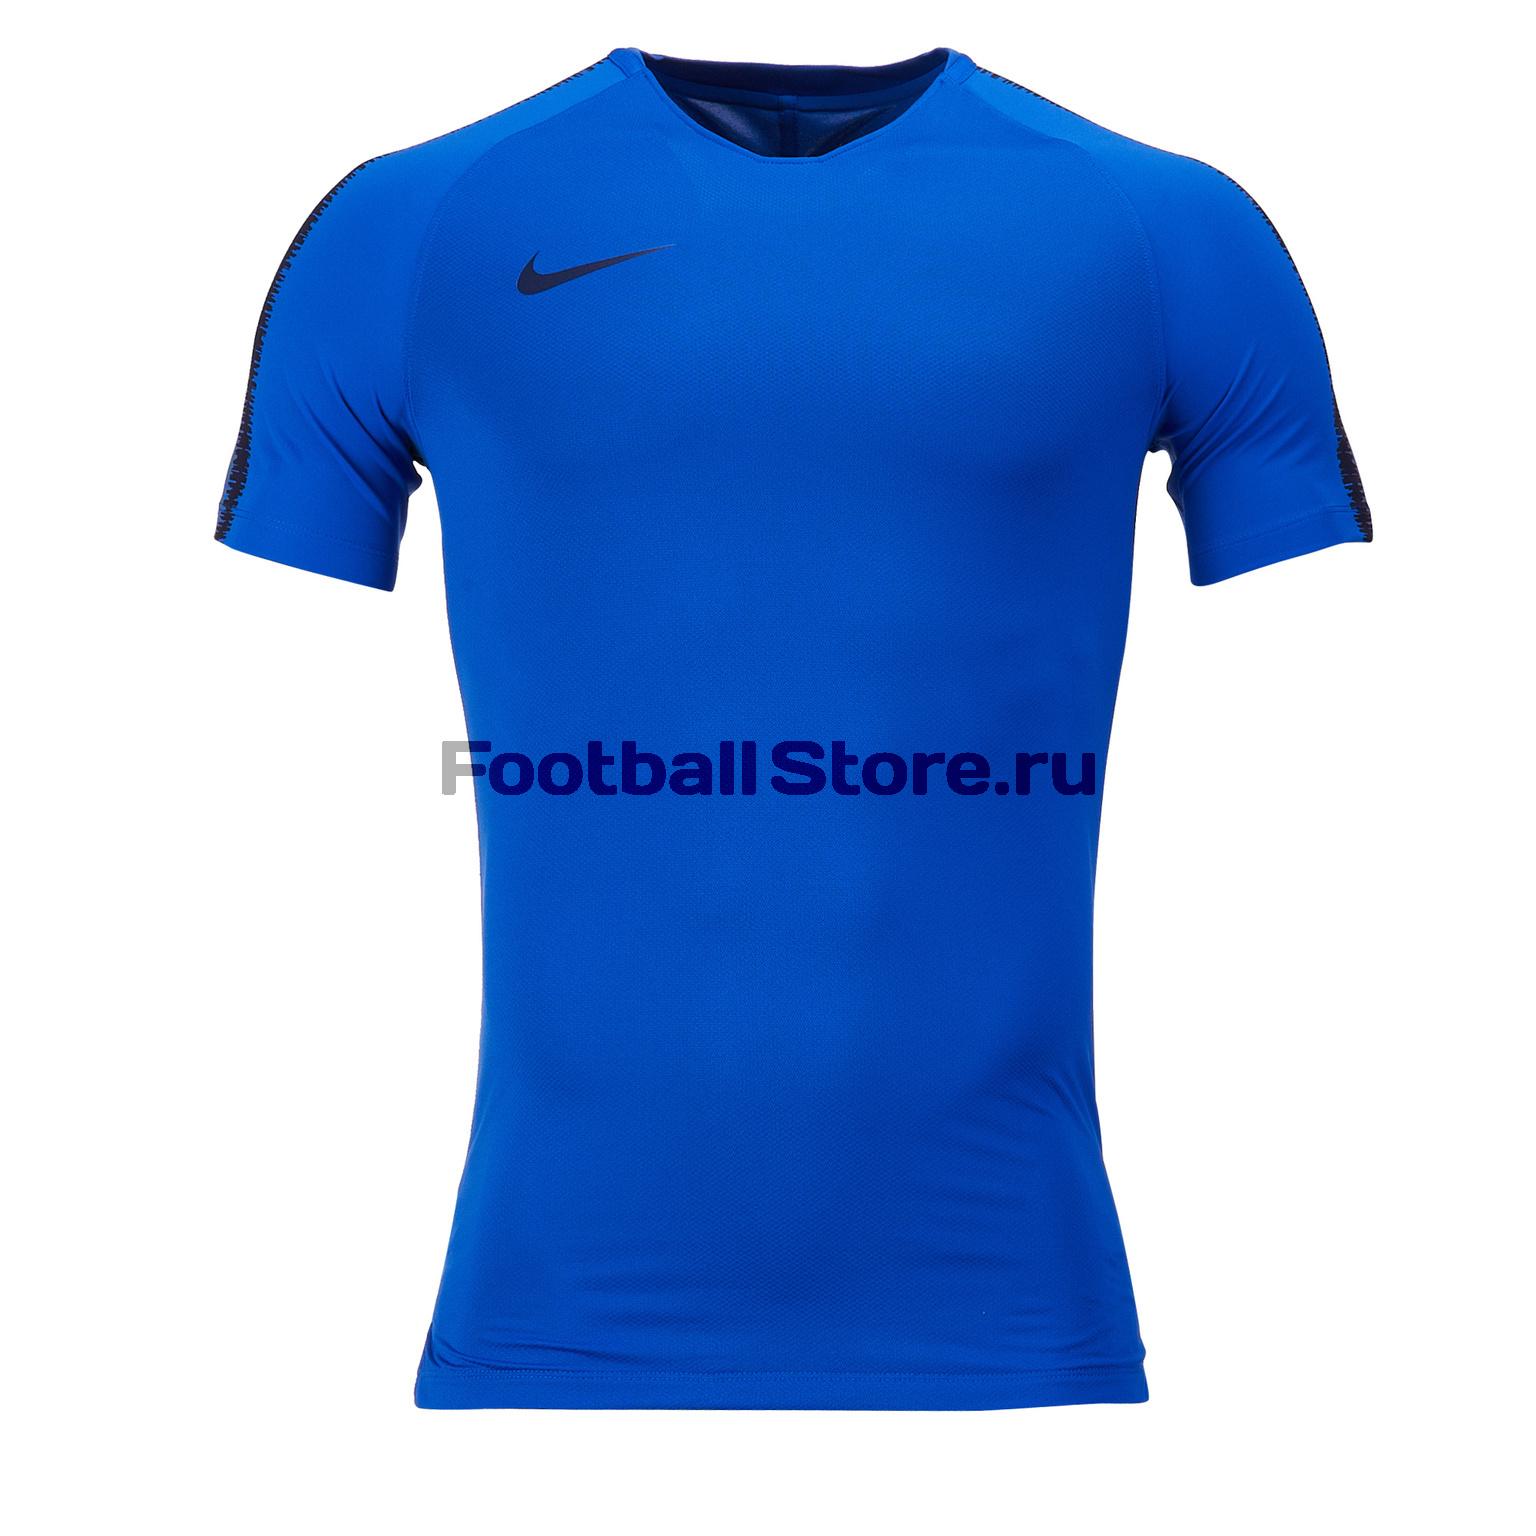 Футболка тренировочная Nike BRT Squad Top SS 894539-405 цена